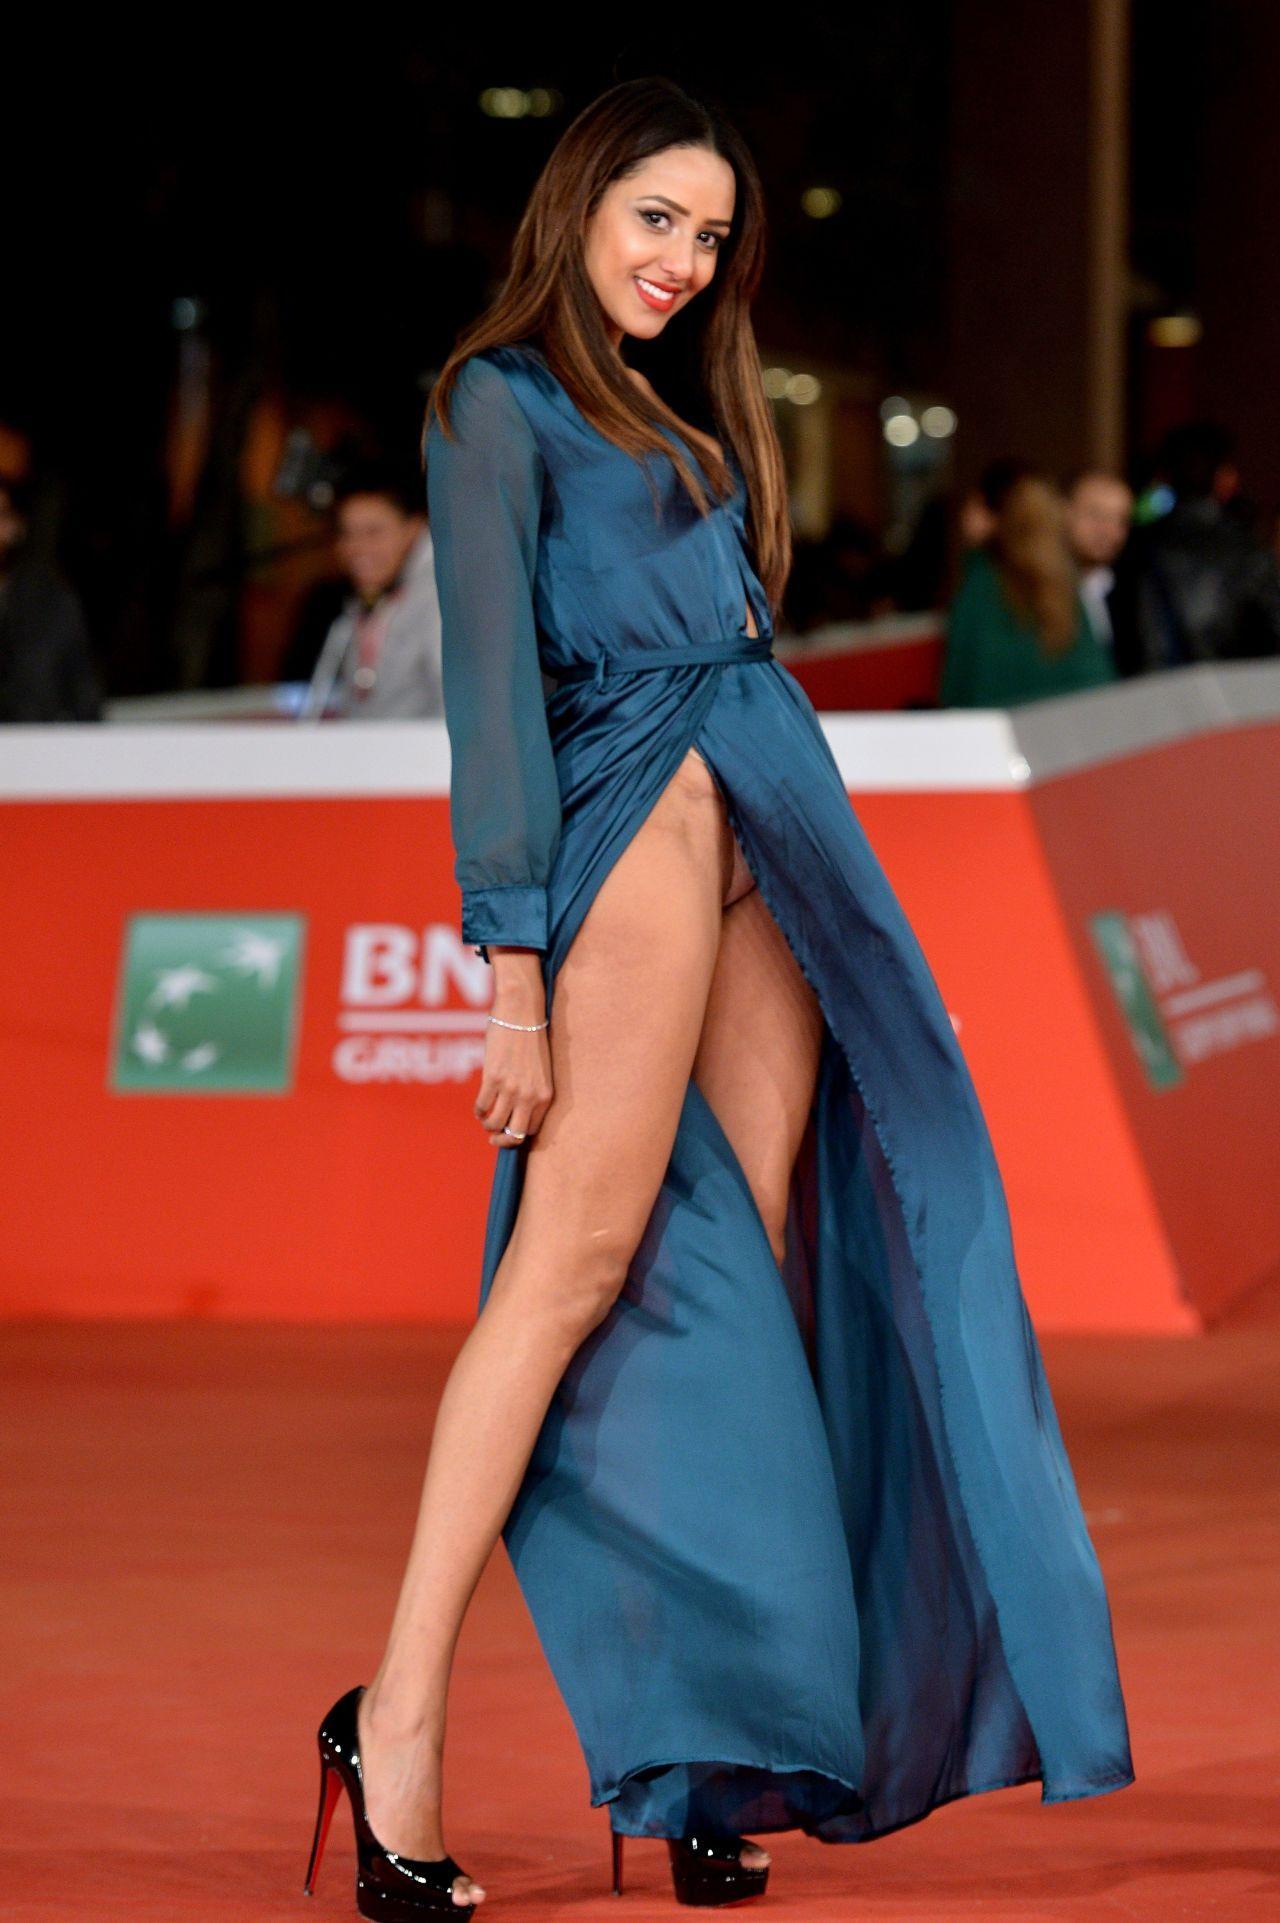 Pics Zaina Dridi nude (59 foto and video), Pussy, Bikini, Boobs, lingerie 2015